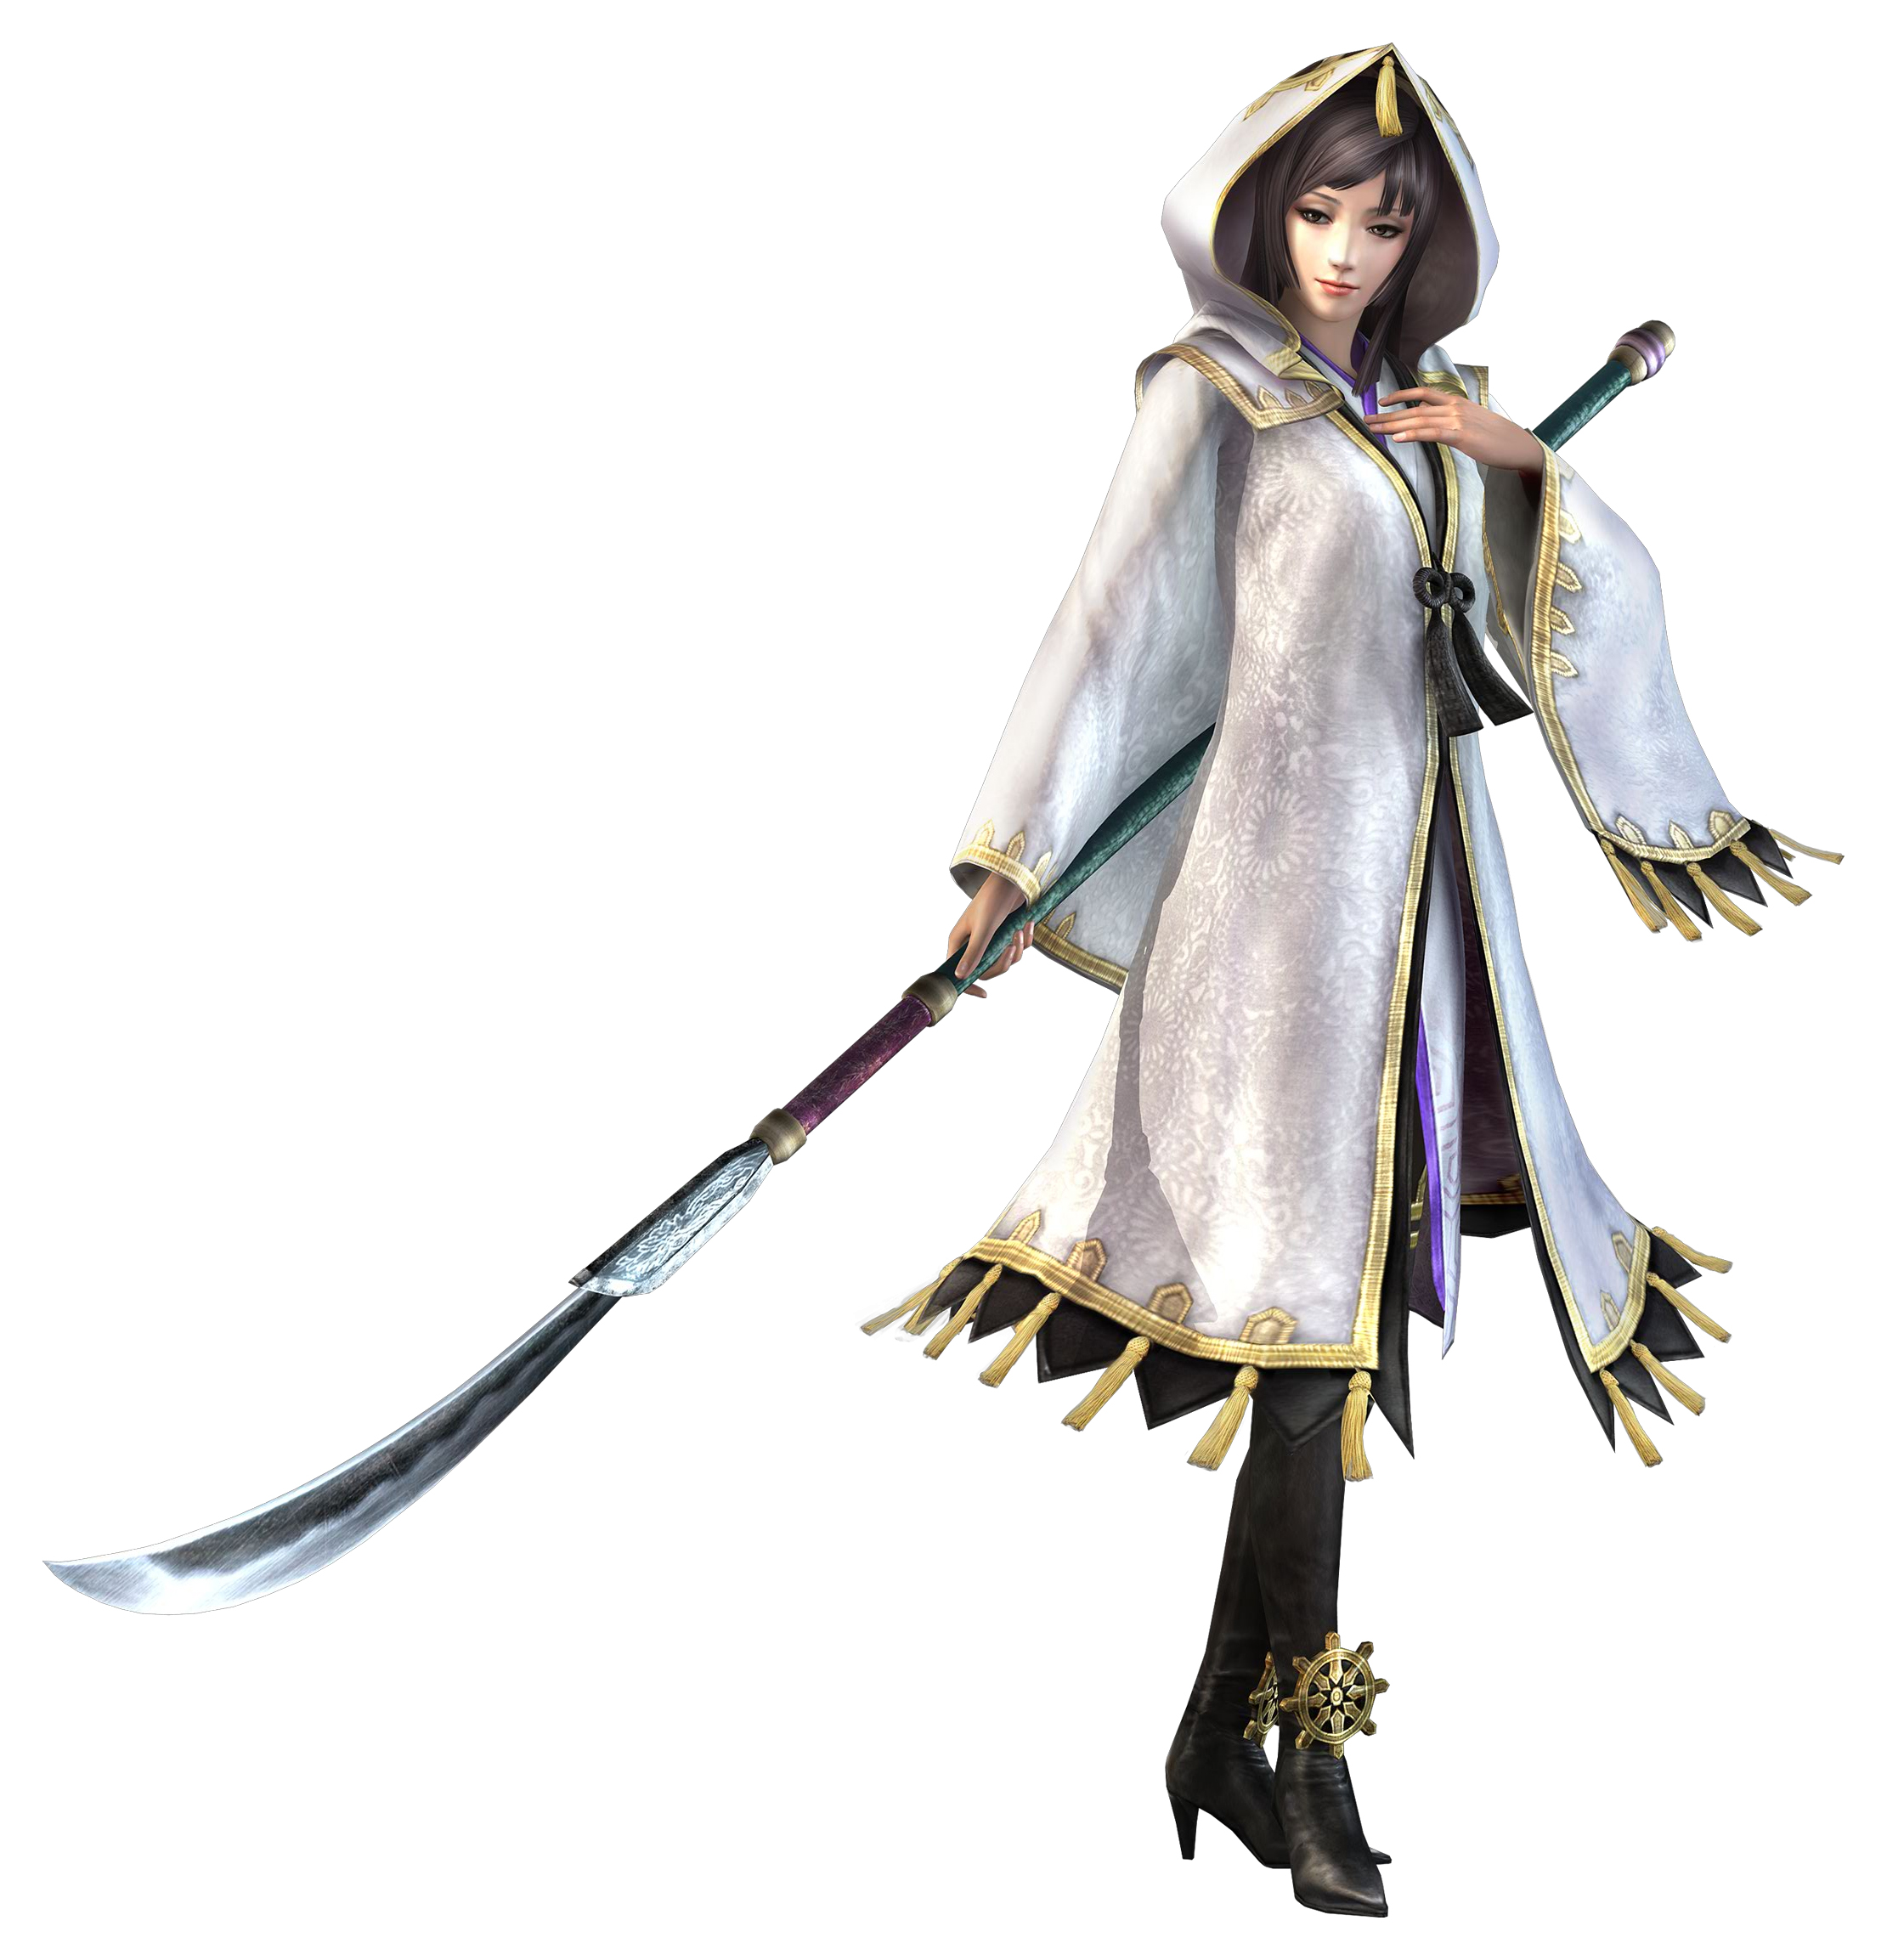 Warriors Orochi 4 All Female Characters: Dynasty/Samurai Warriors/ Warriors Orochi 3 RPs